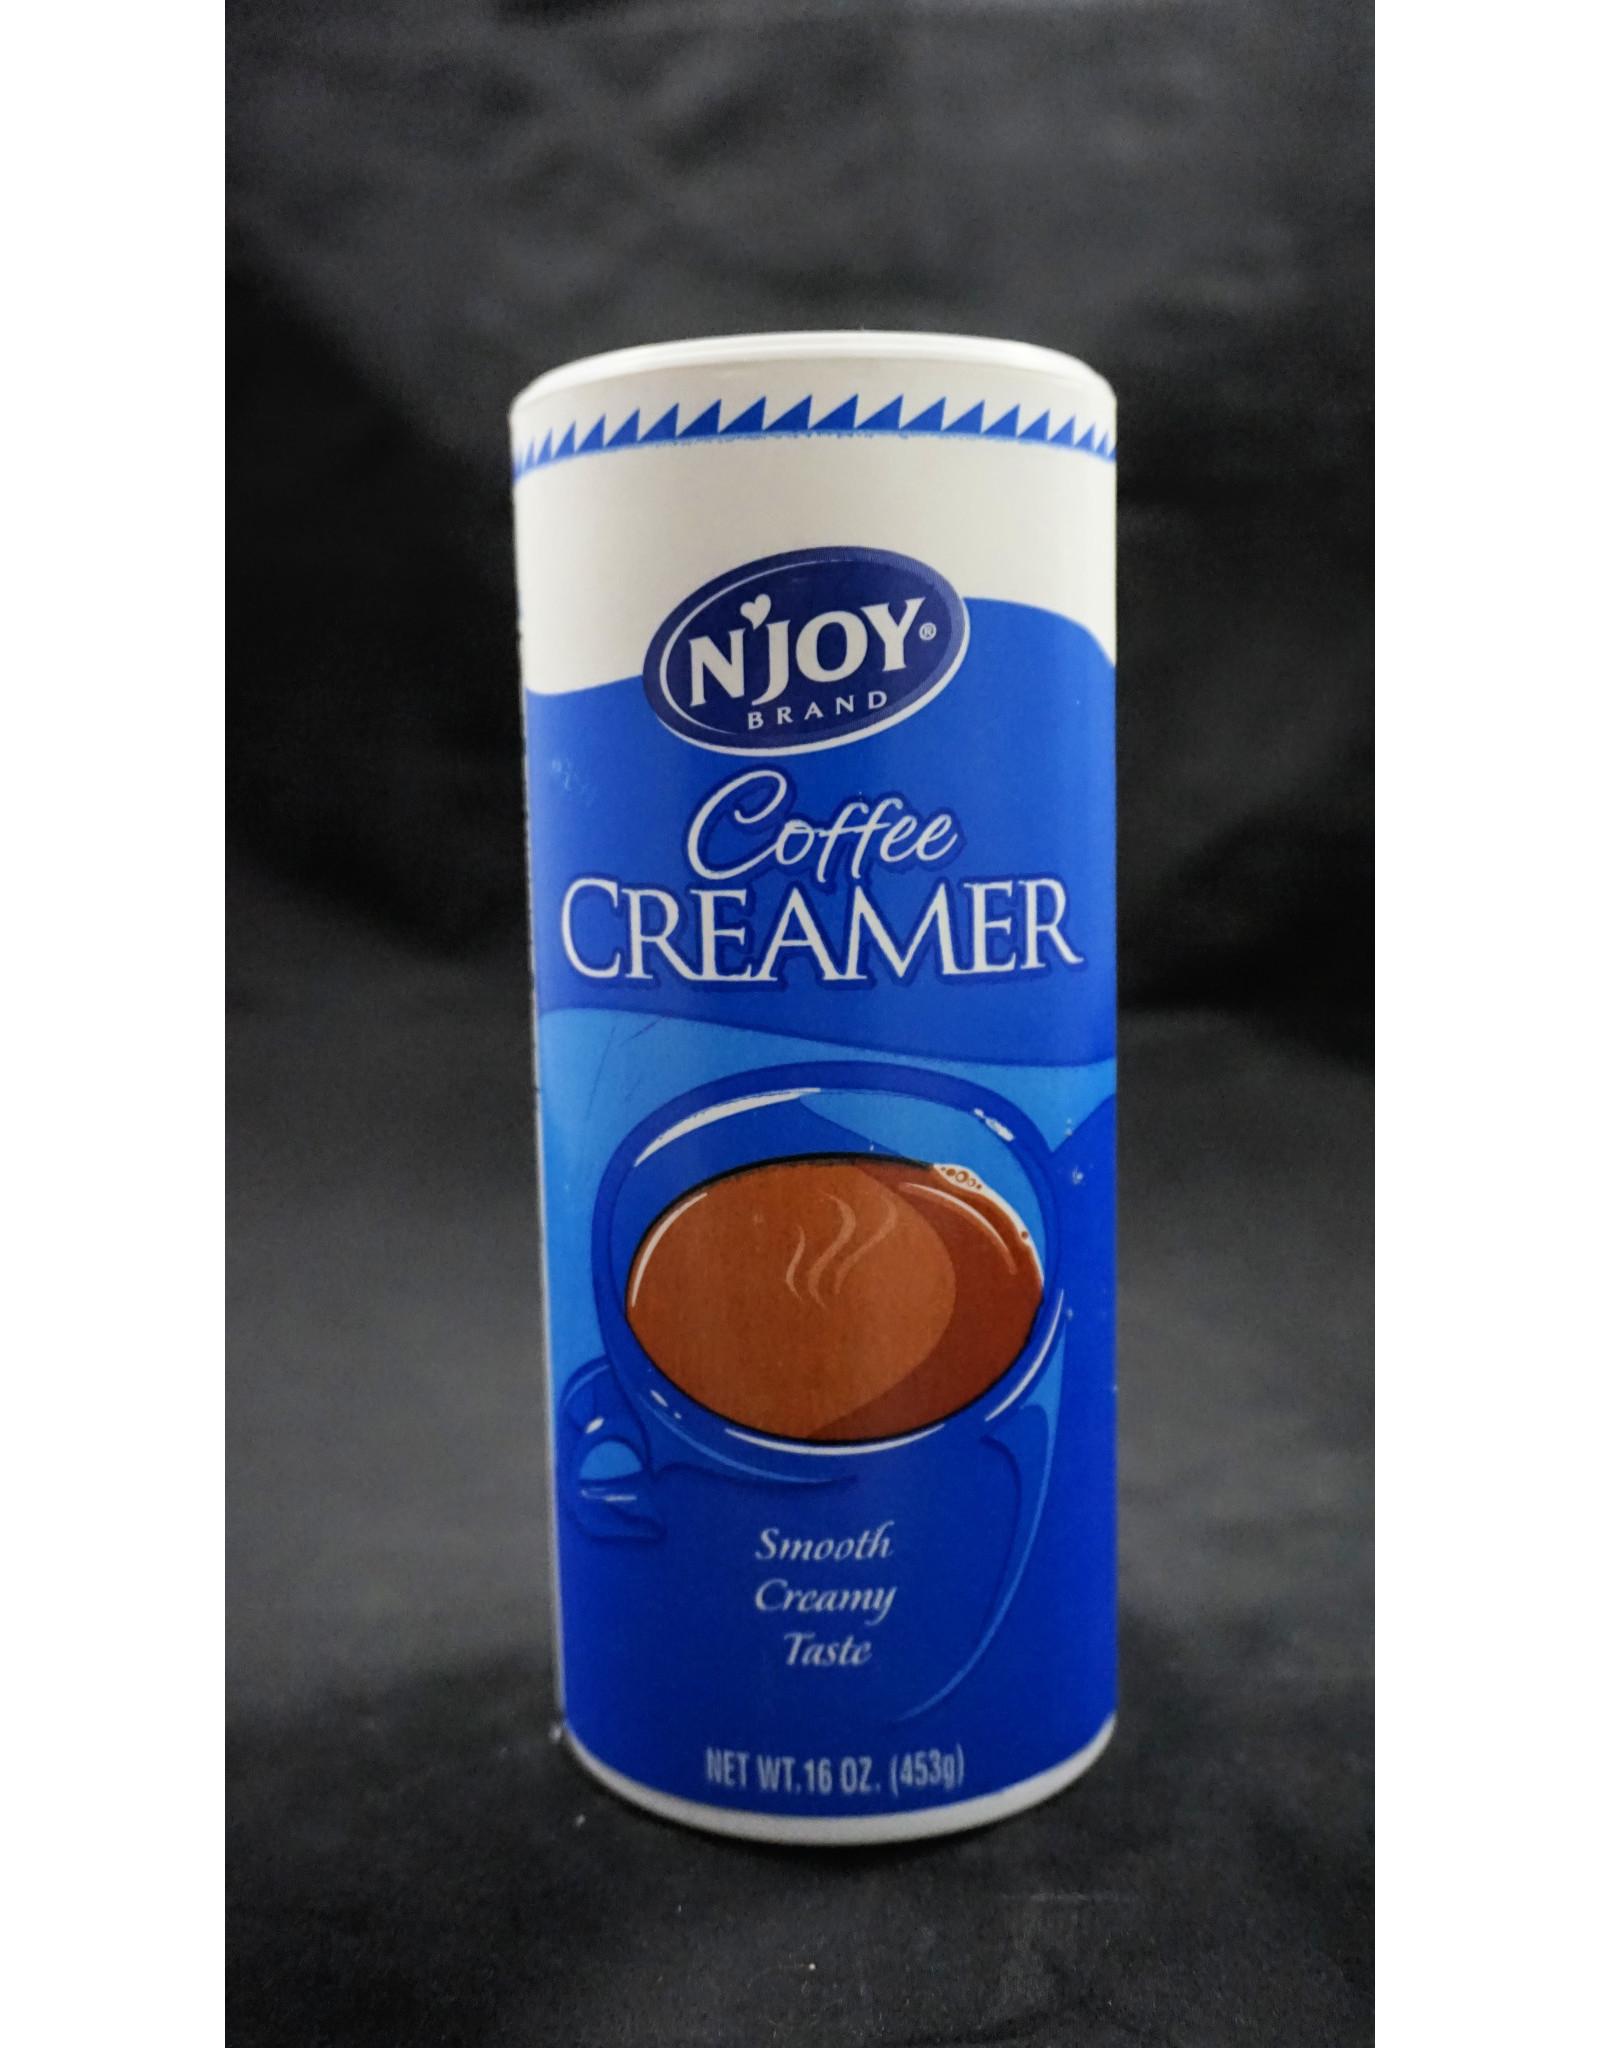 Njoy Coffee Creamer Diversion Safe